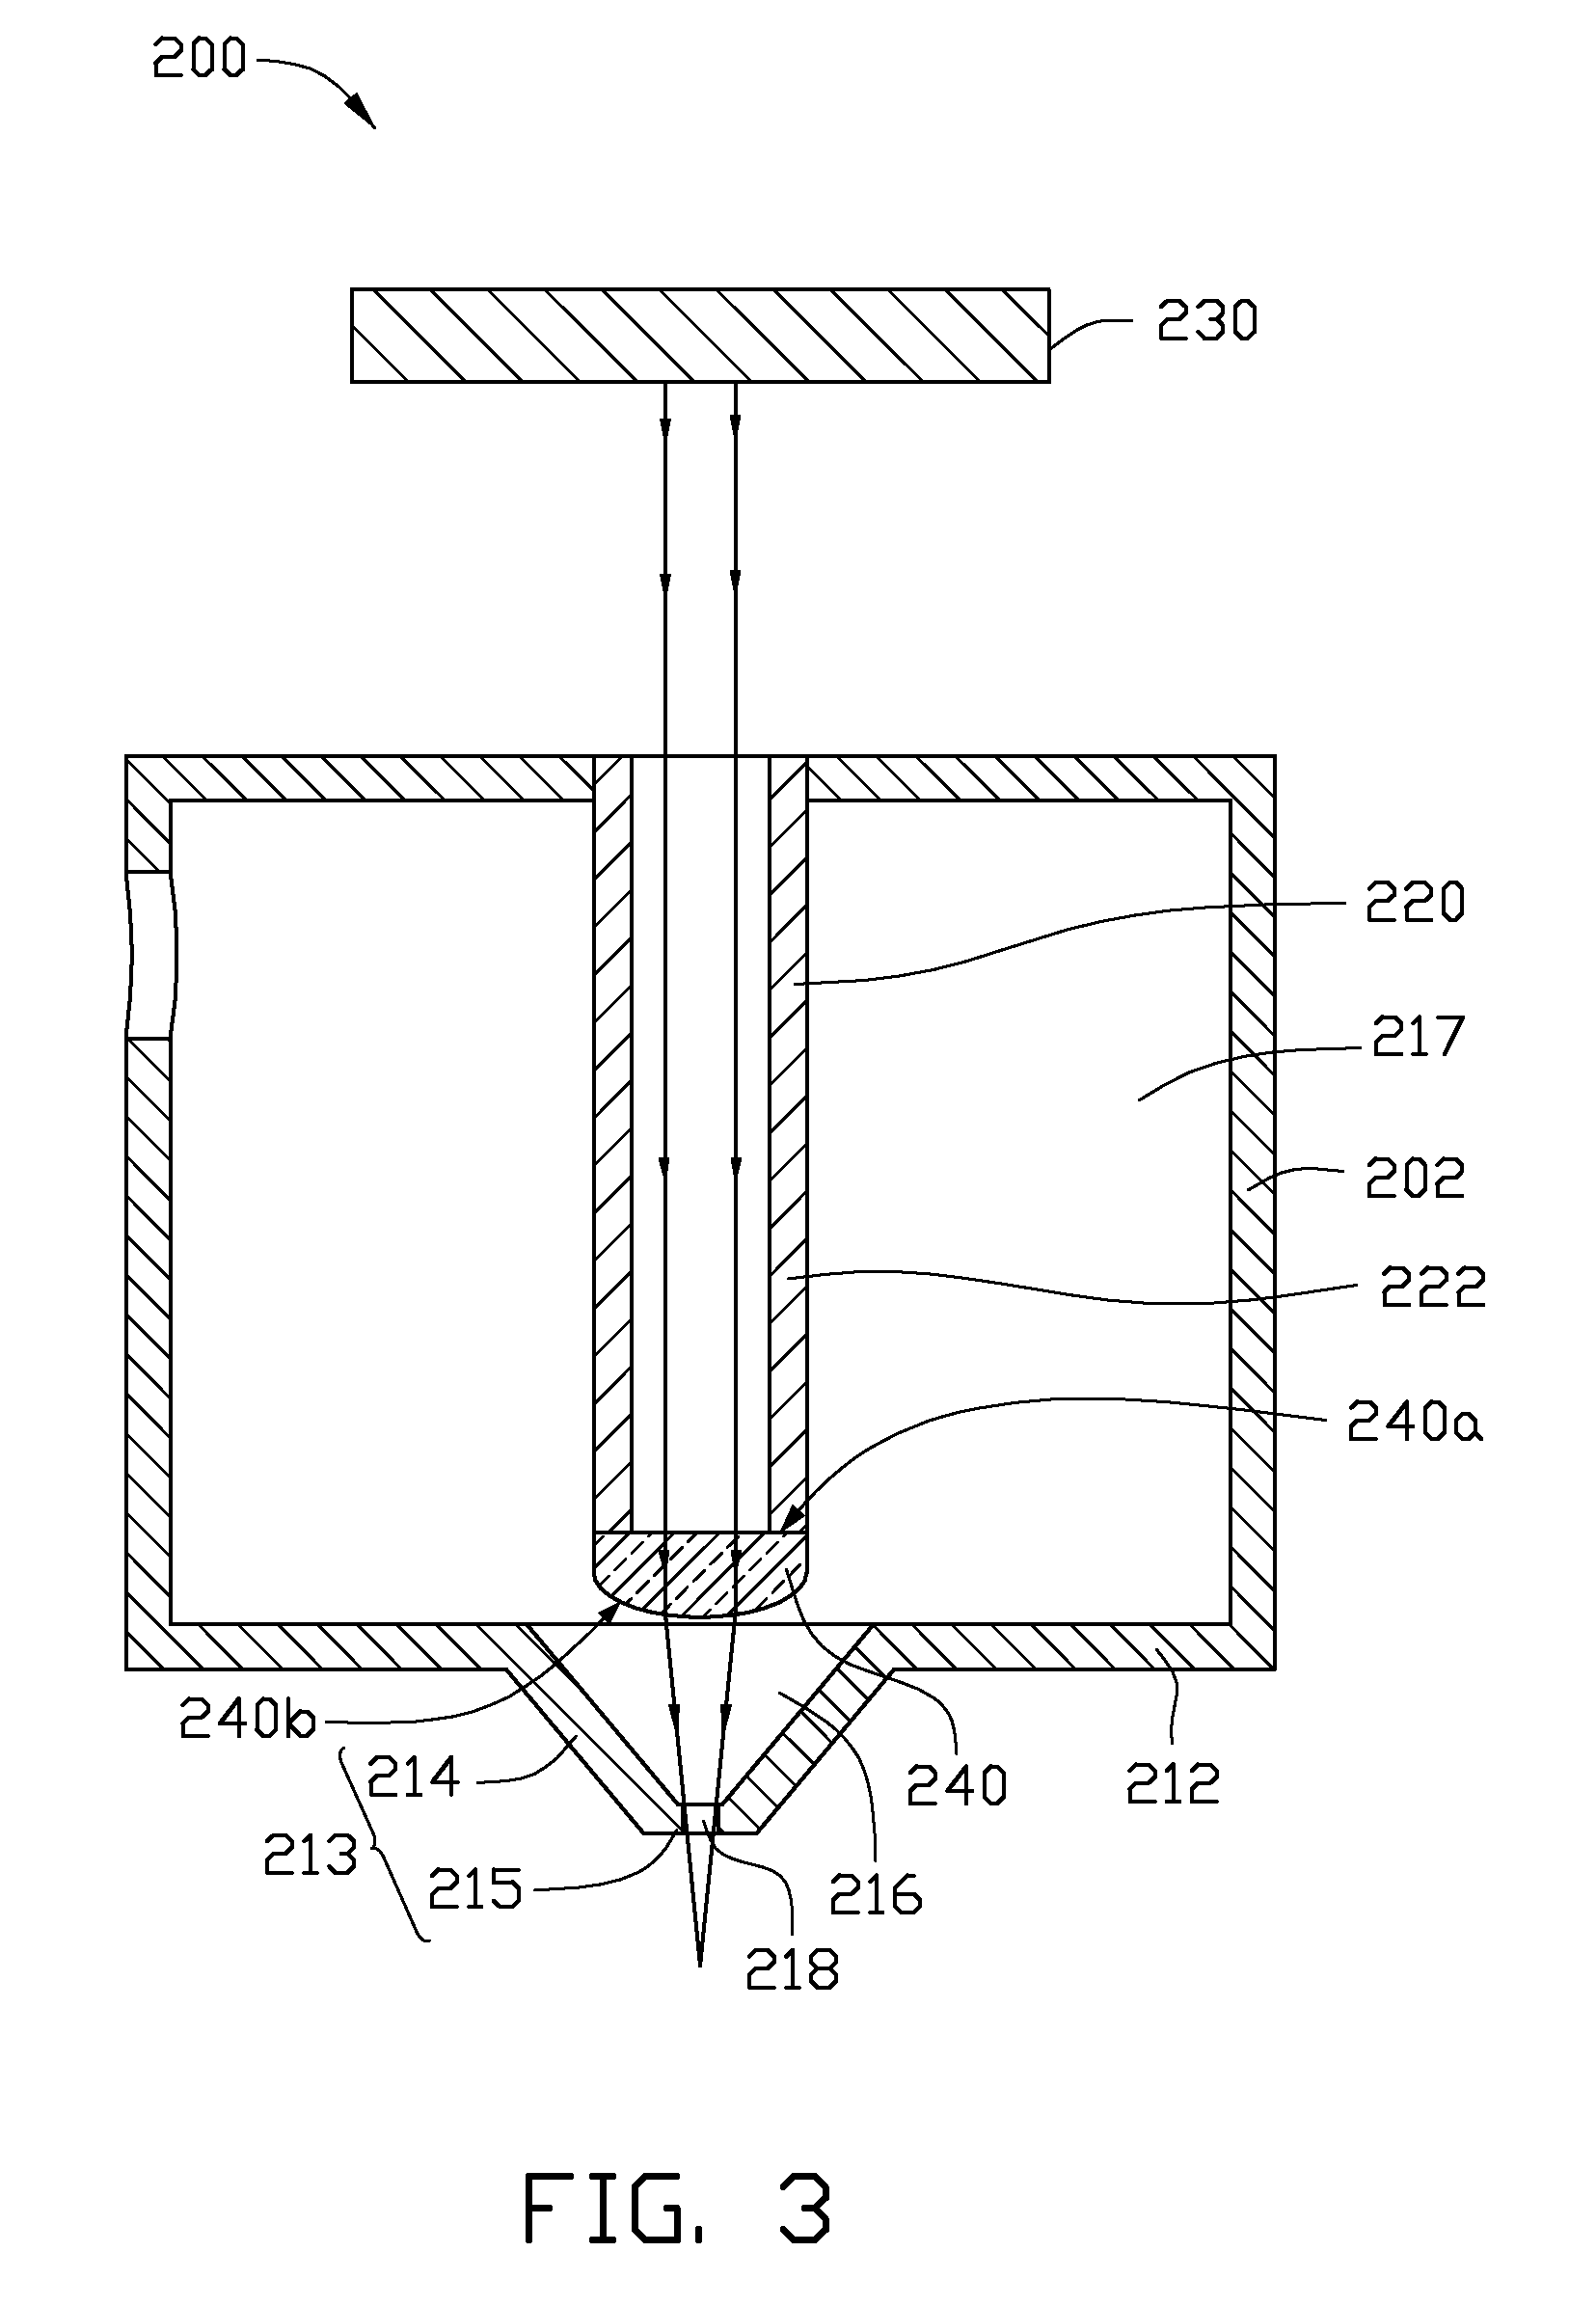 Zl 1705 Ic Starter Wiring Diagram In Addition 208 Volt Motor